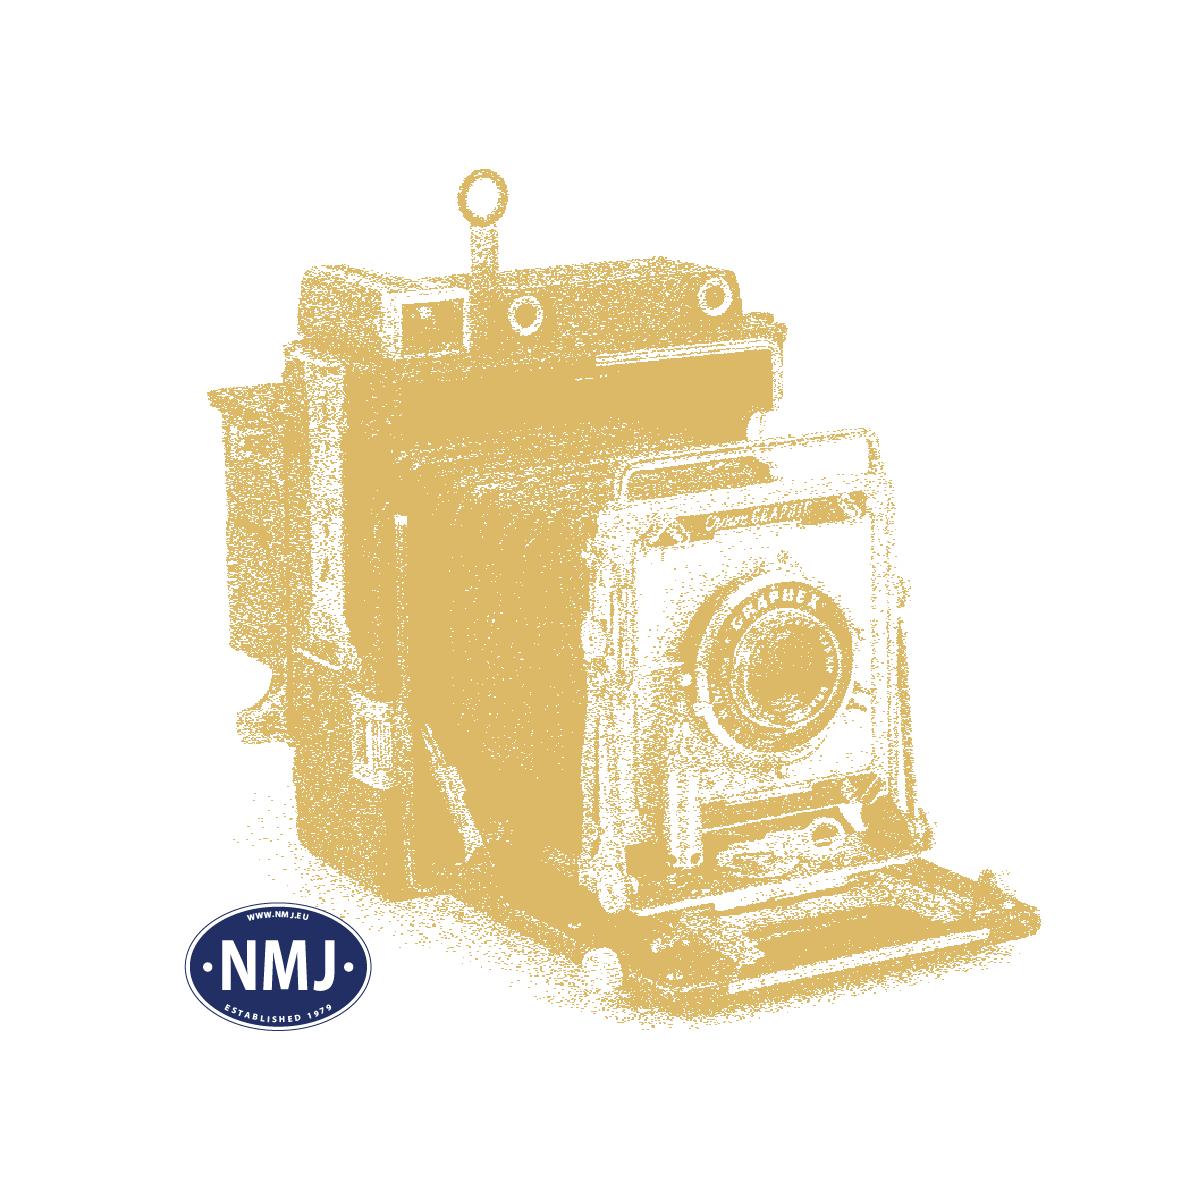 NMJT84.101 - NMJ Topline NSB BM69A.01, DCC m/ Sound